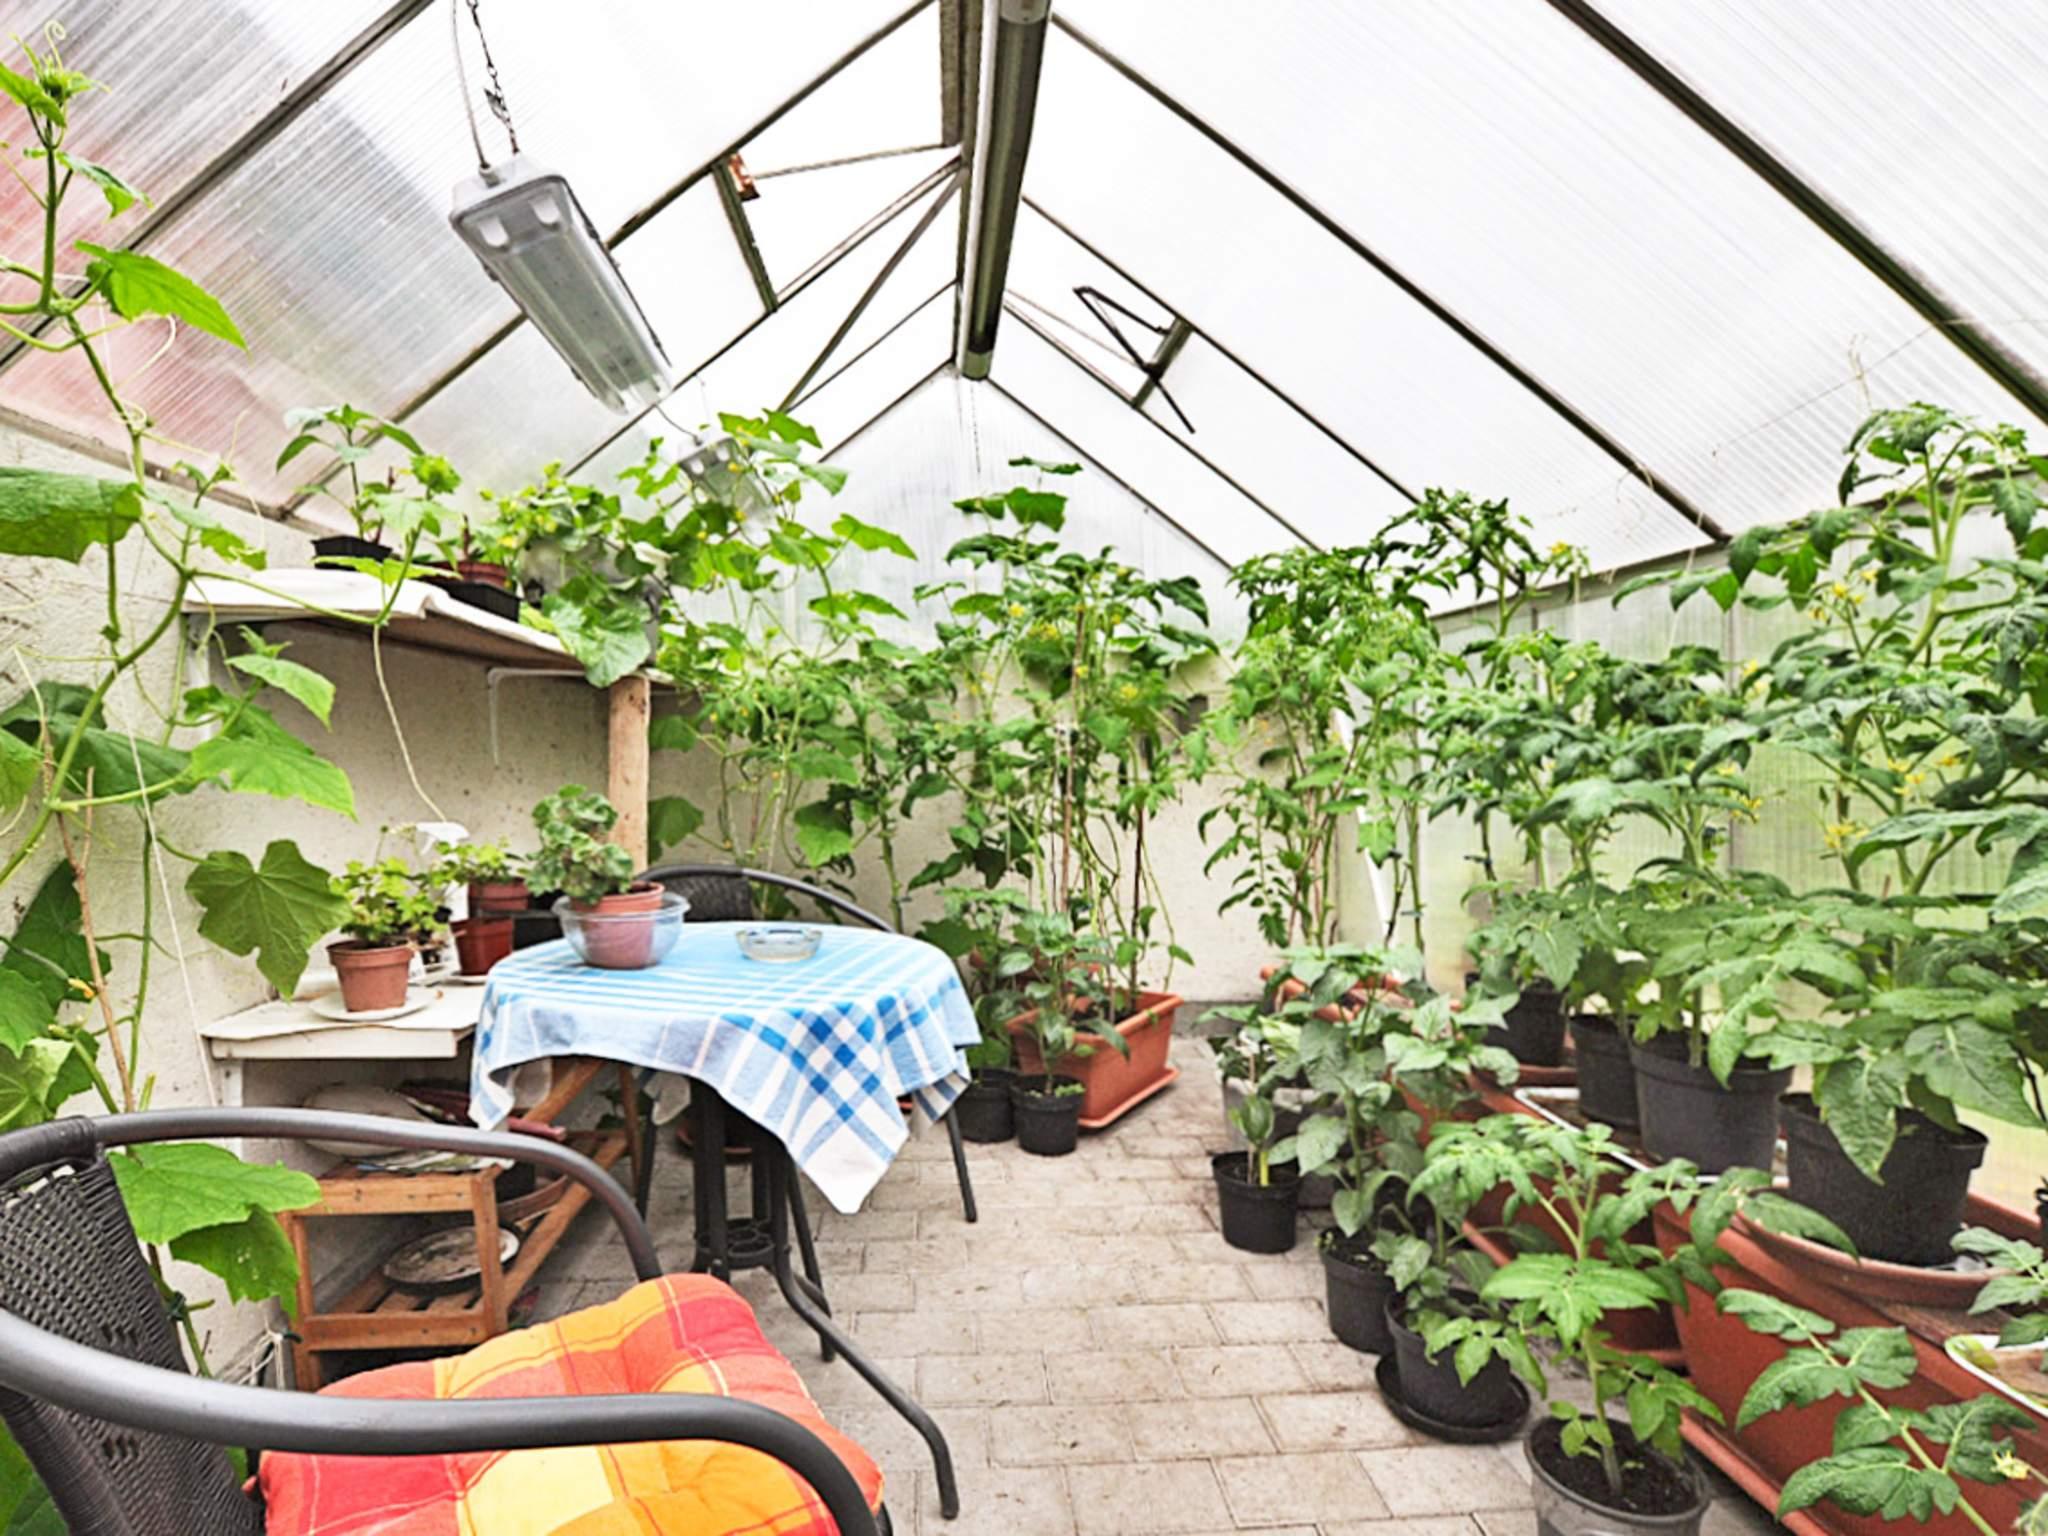 Ferienhaus Finjasjön (86936), Hässleholm, Skane län, Südschweden, Schweden, Bild 15